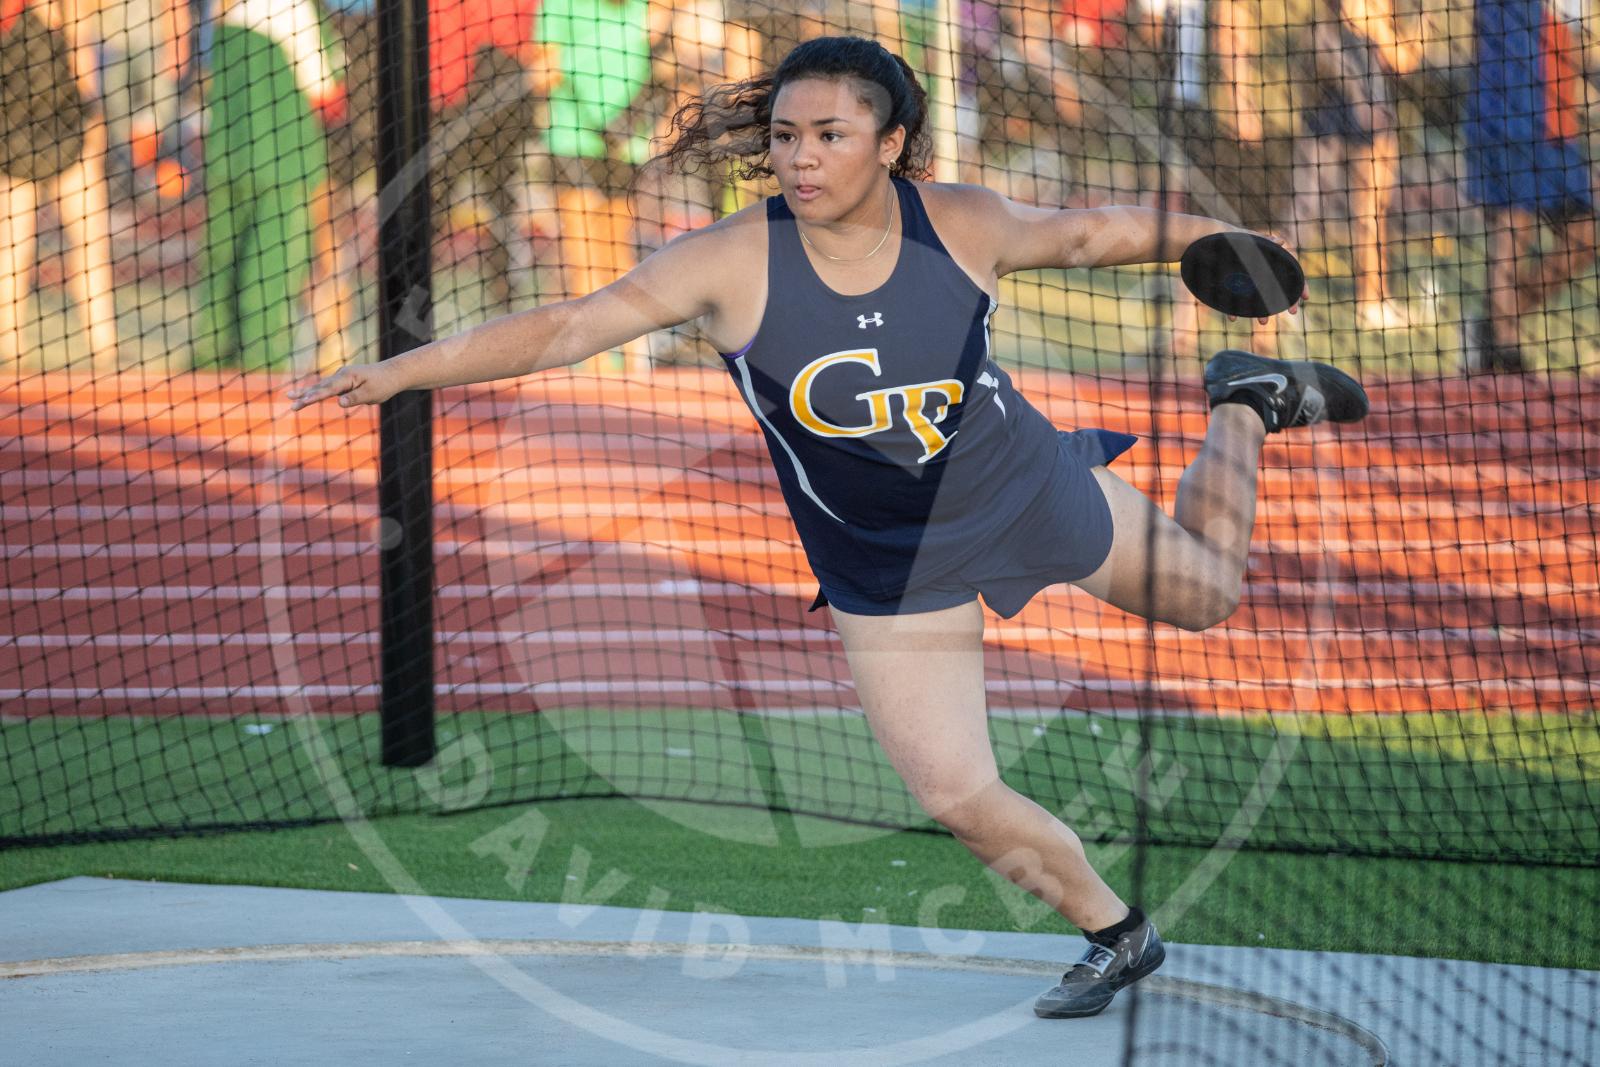 Athlete competing in discus